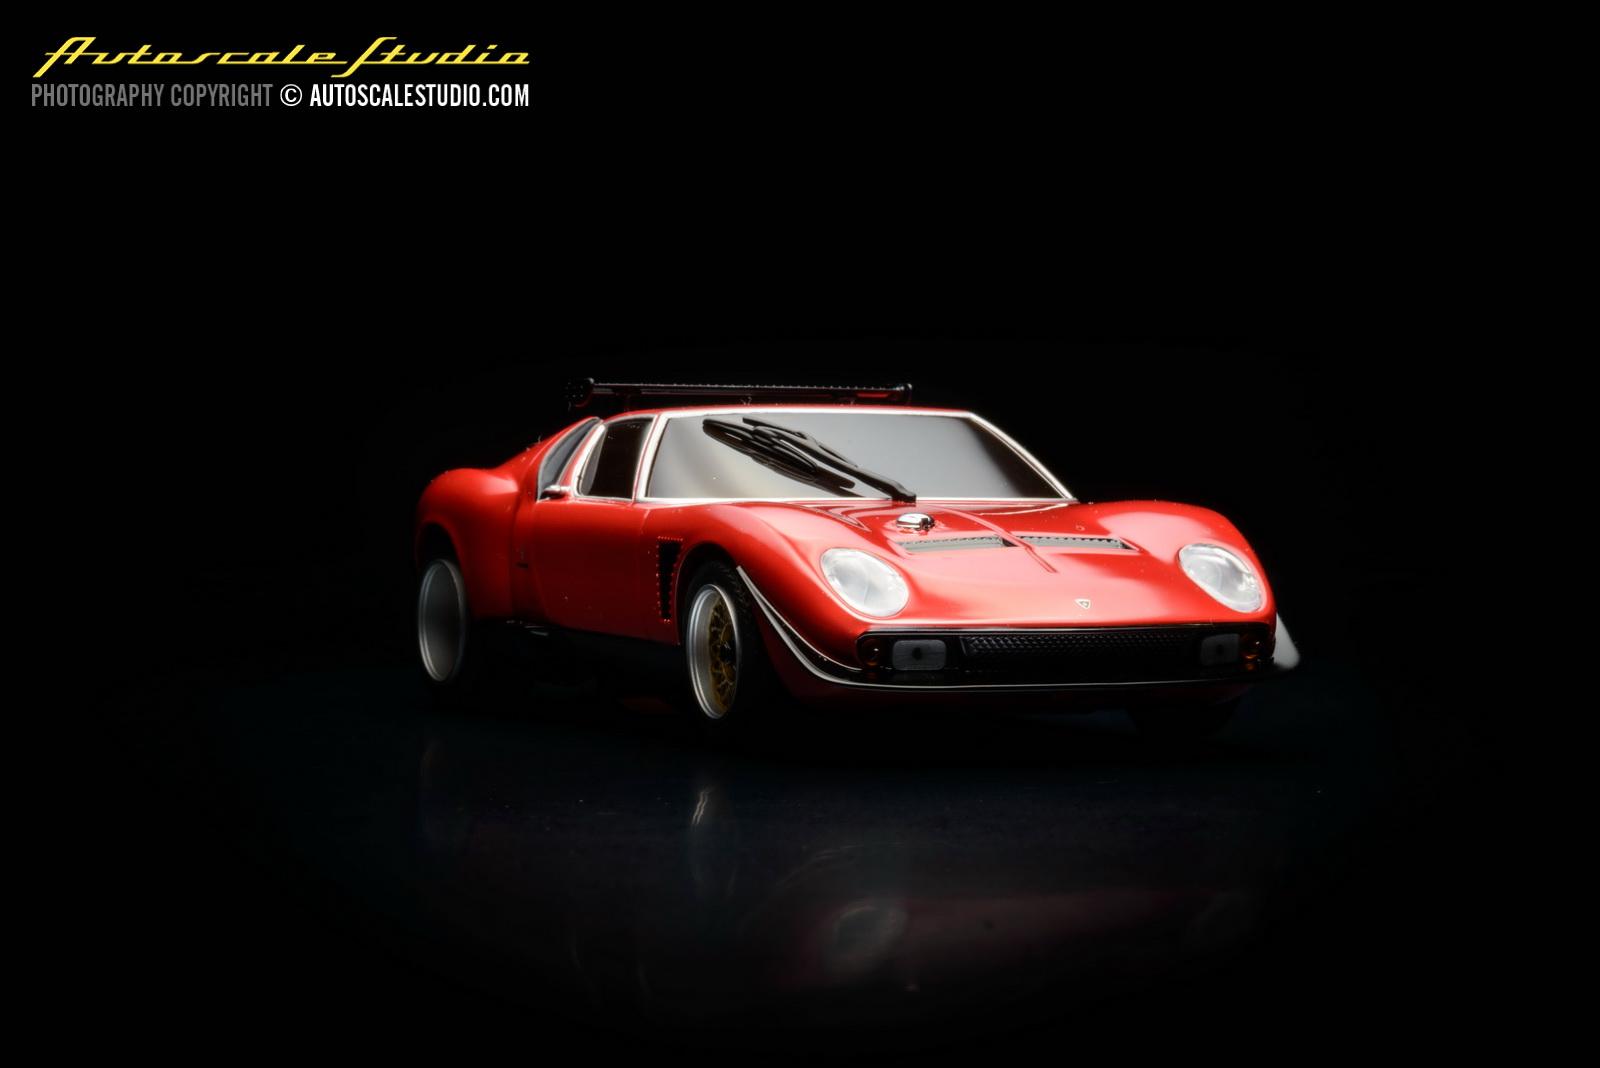 Mzg36r Lamborghini Jota Svr Red Autoscale Studio オートスケール・スタジオ